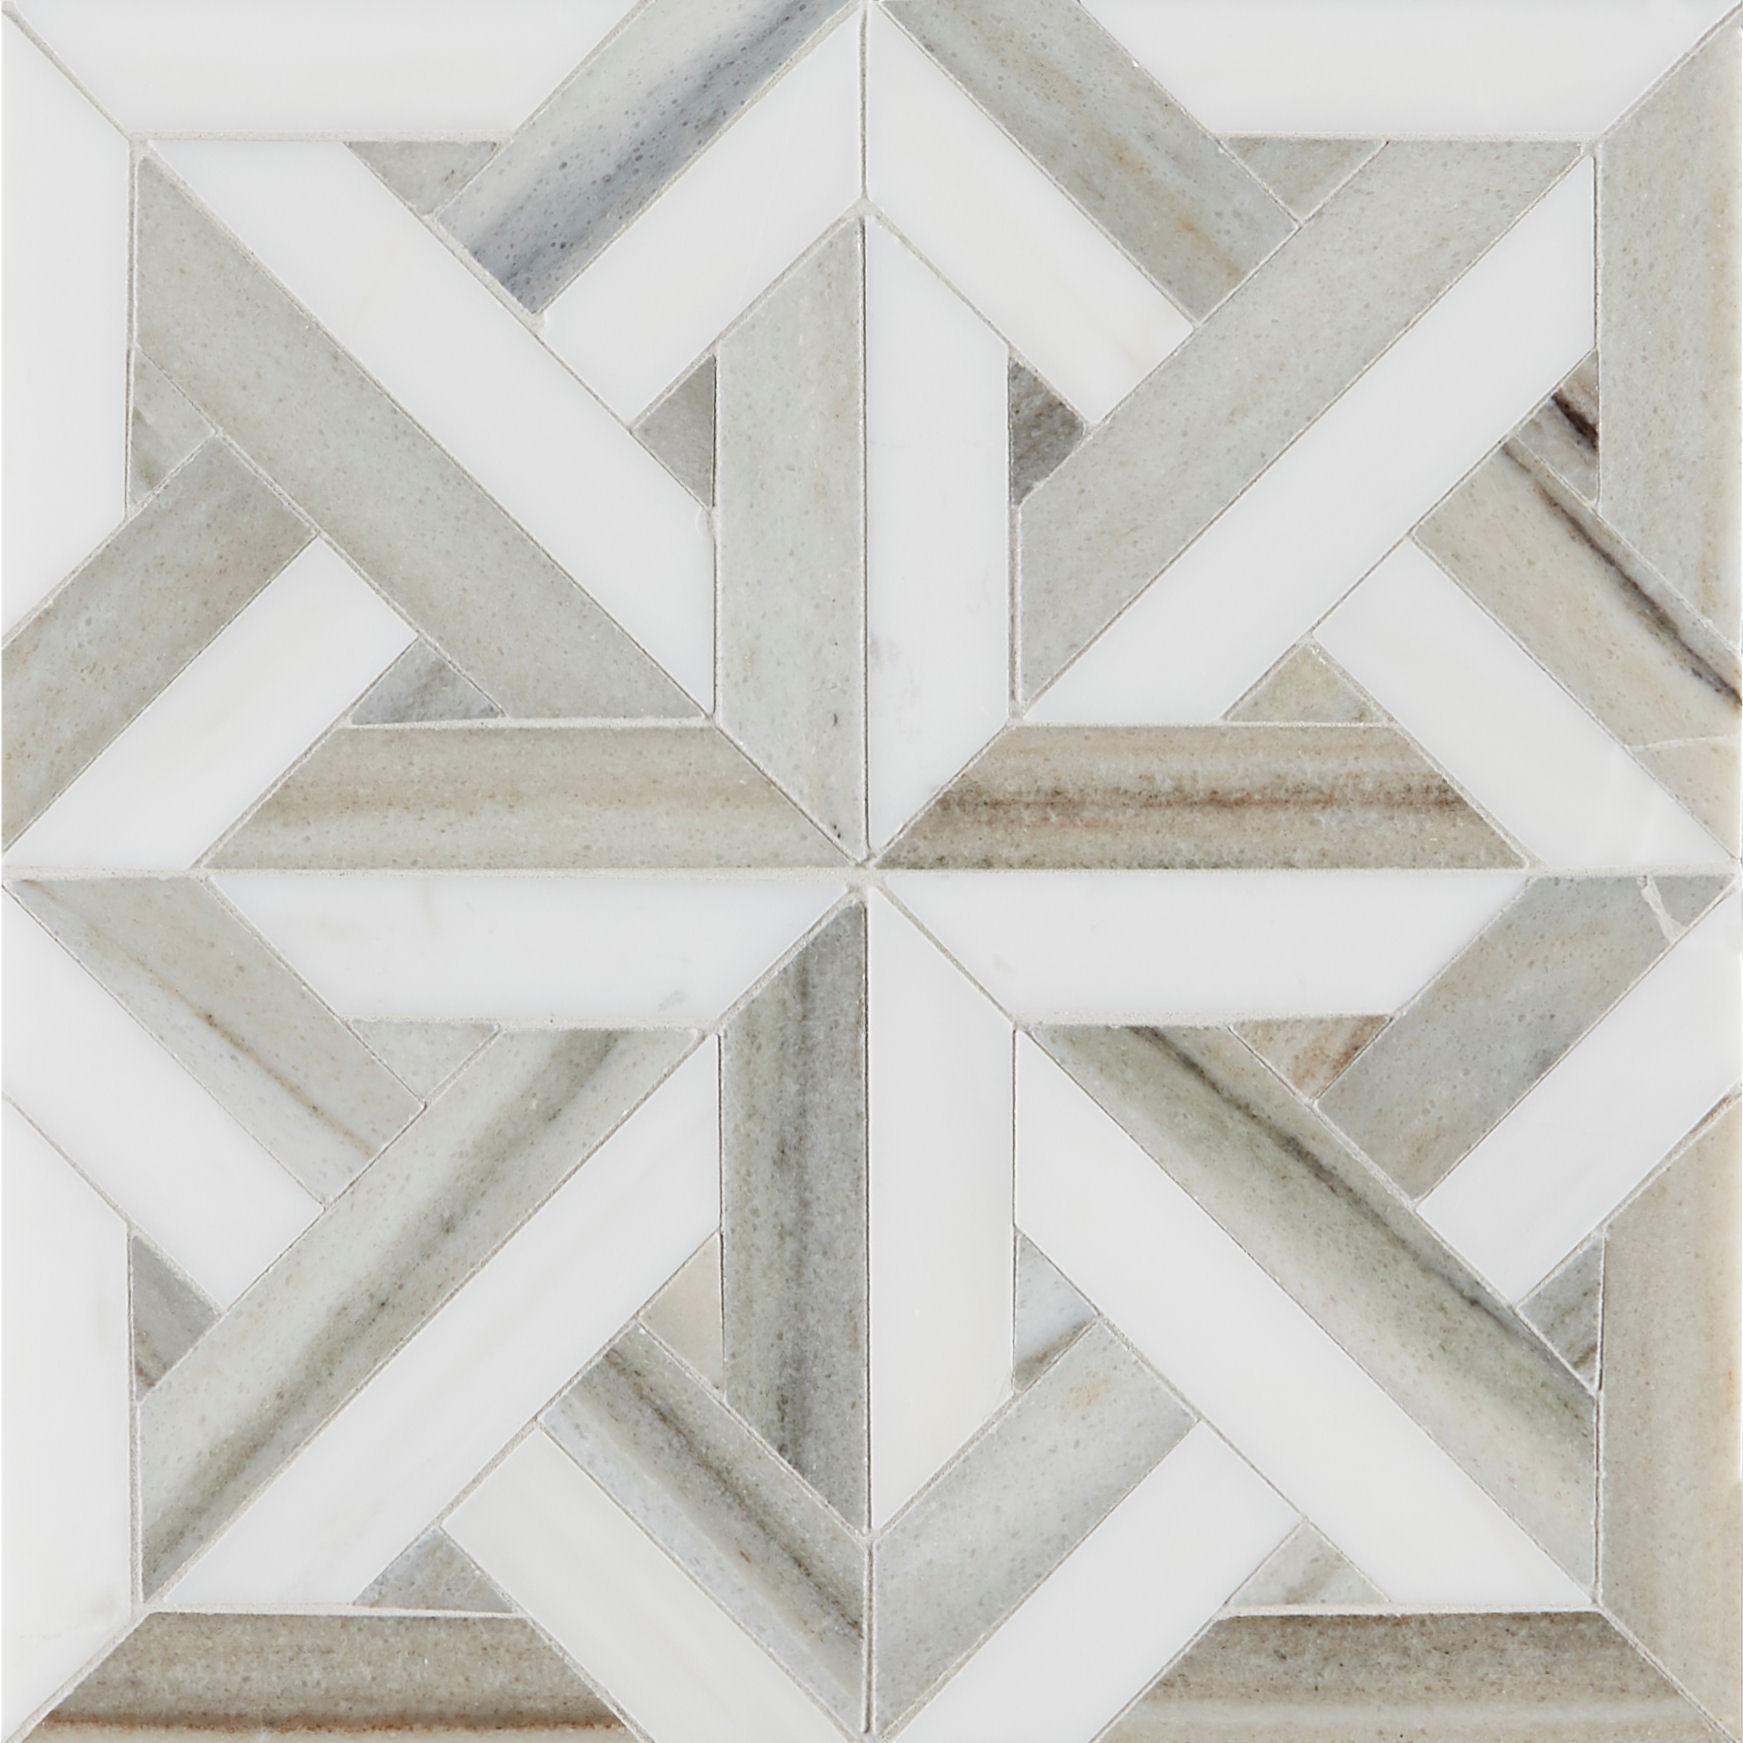 Pyrenees Honed Polished Small Lattice Marble Mosaic Tiles